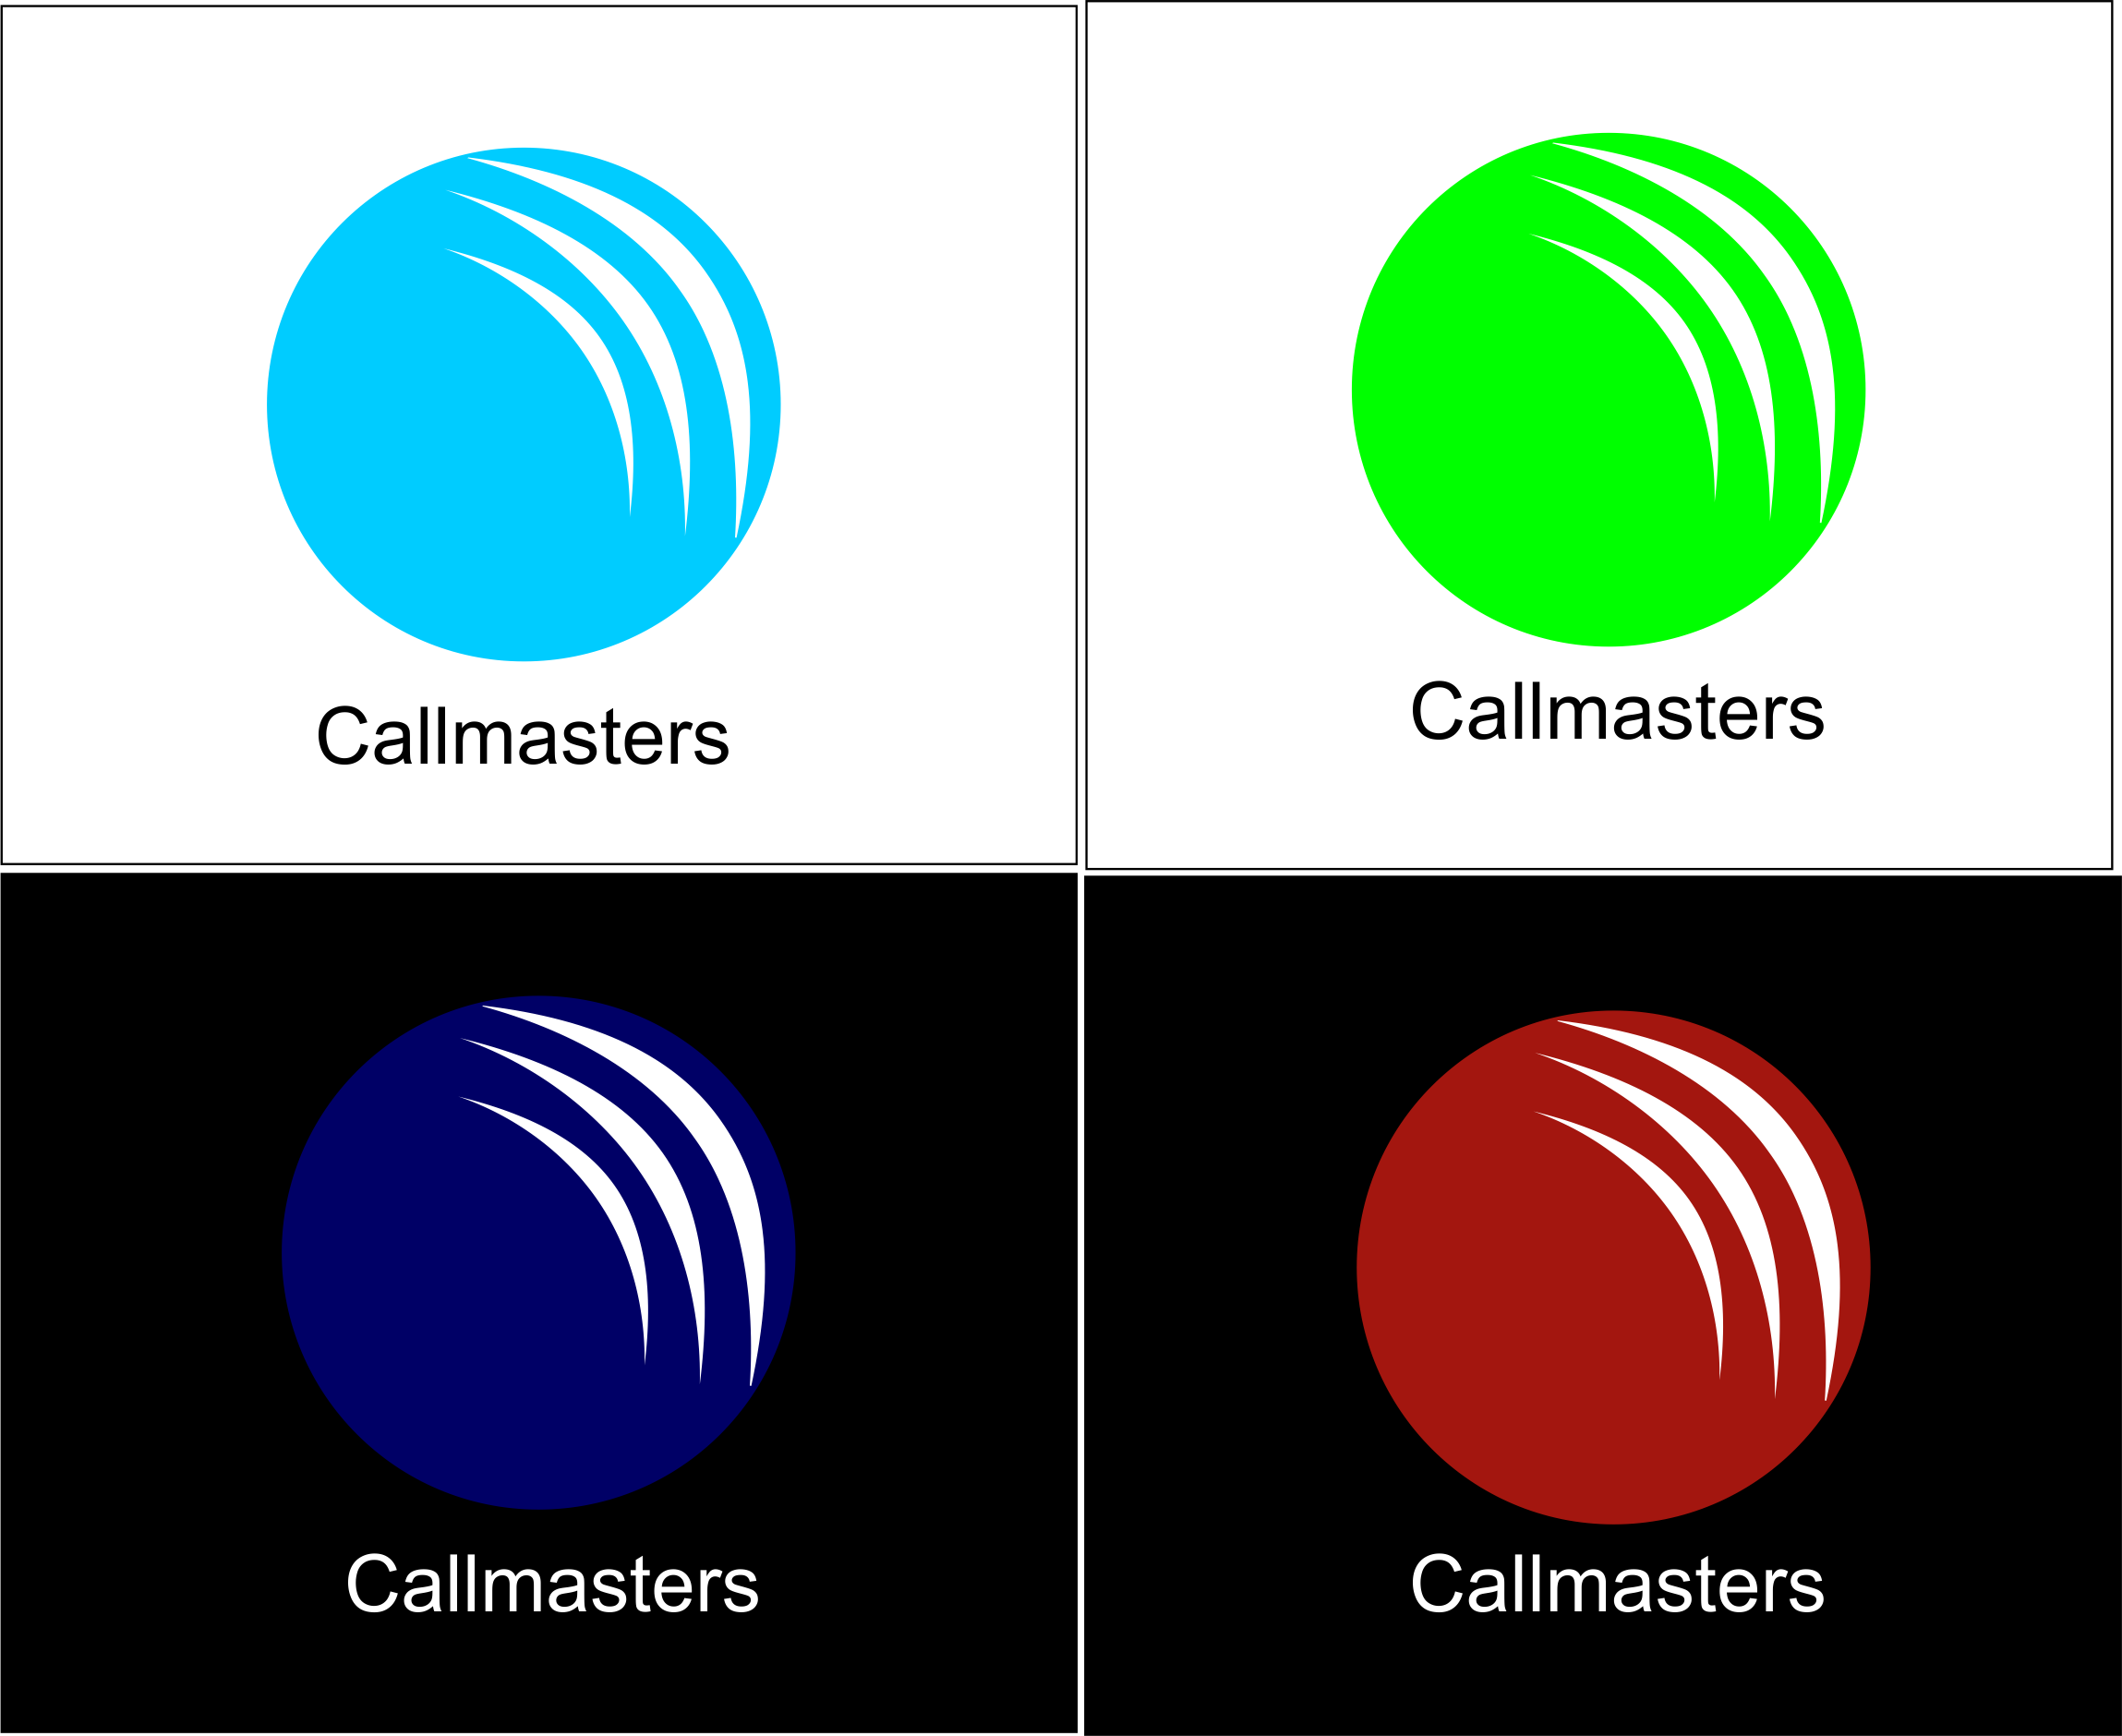 Логотип call-центра Callmasters  фото f_0045b69a3fc5a0e5.png